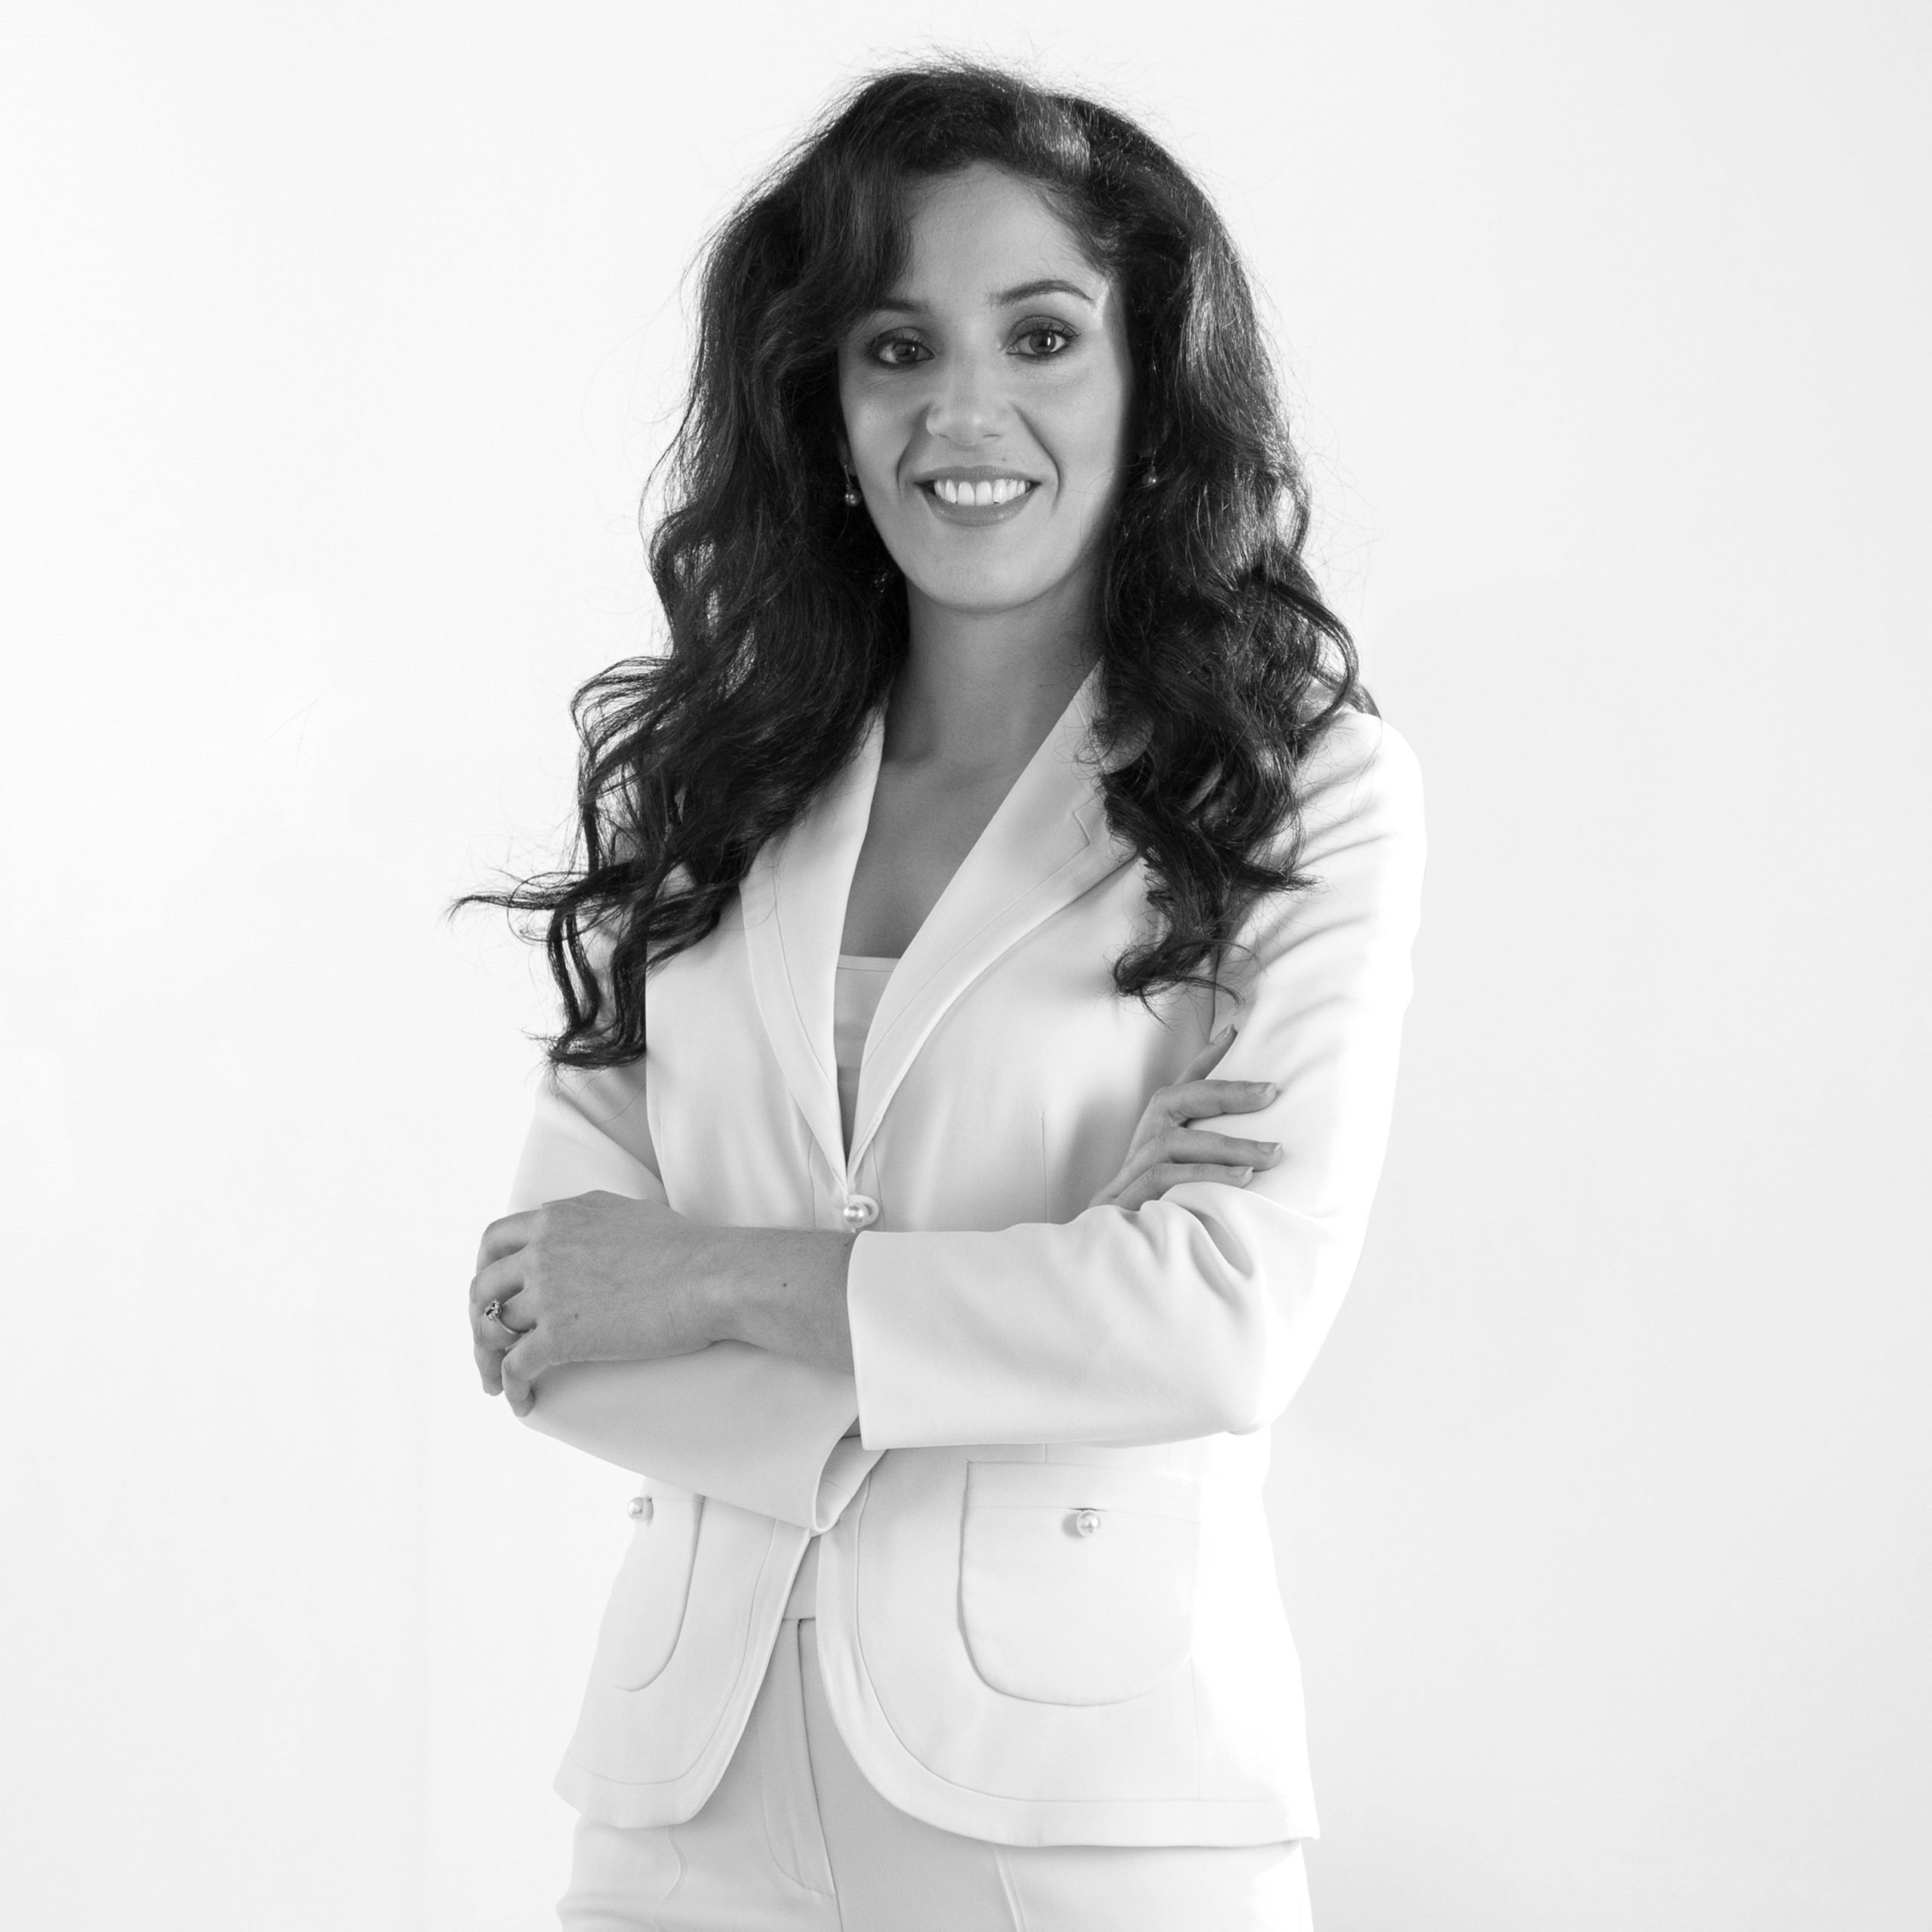 Carolina Proleven